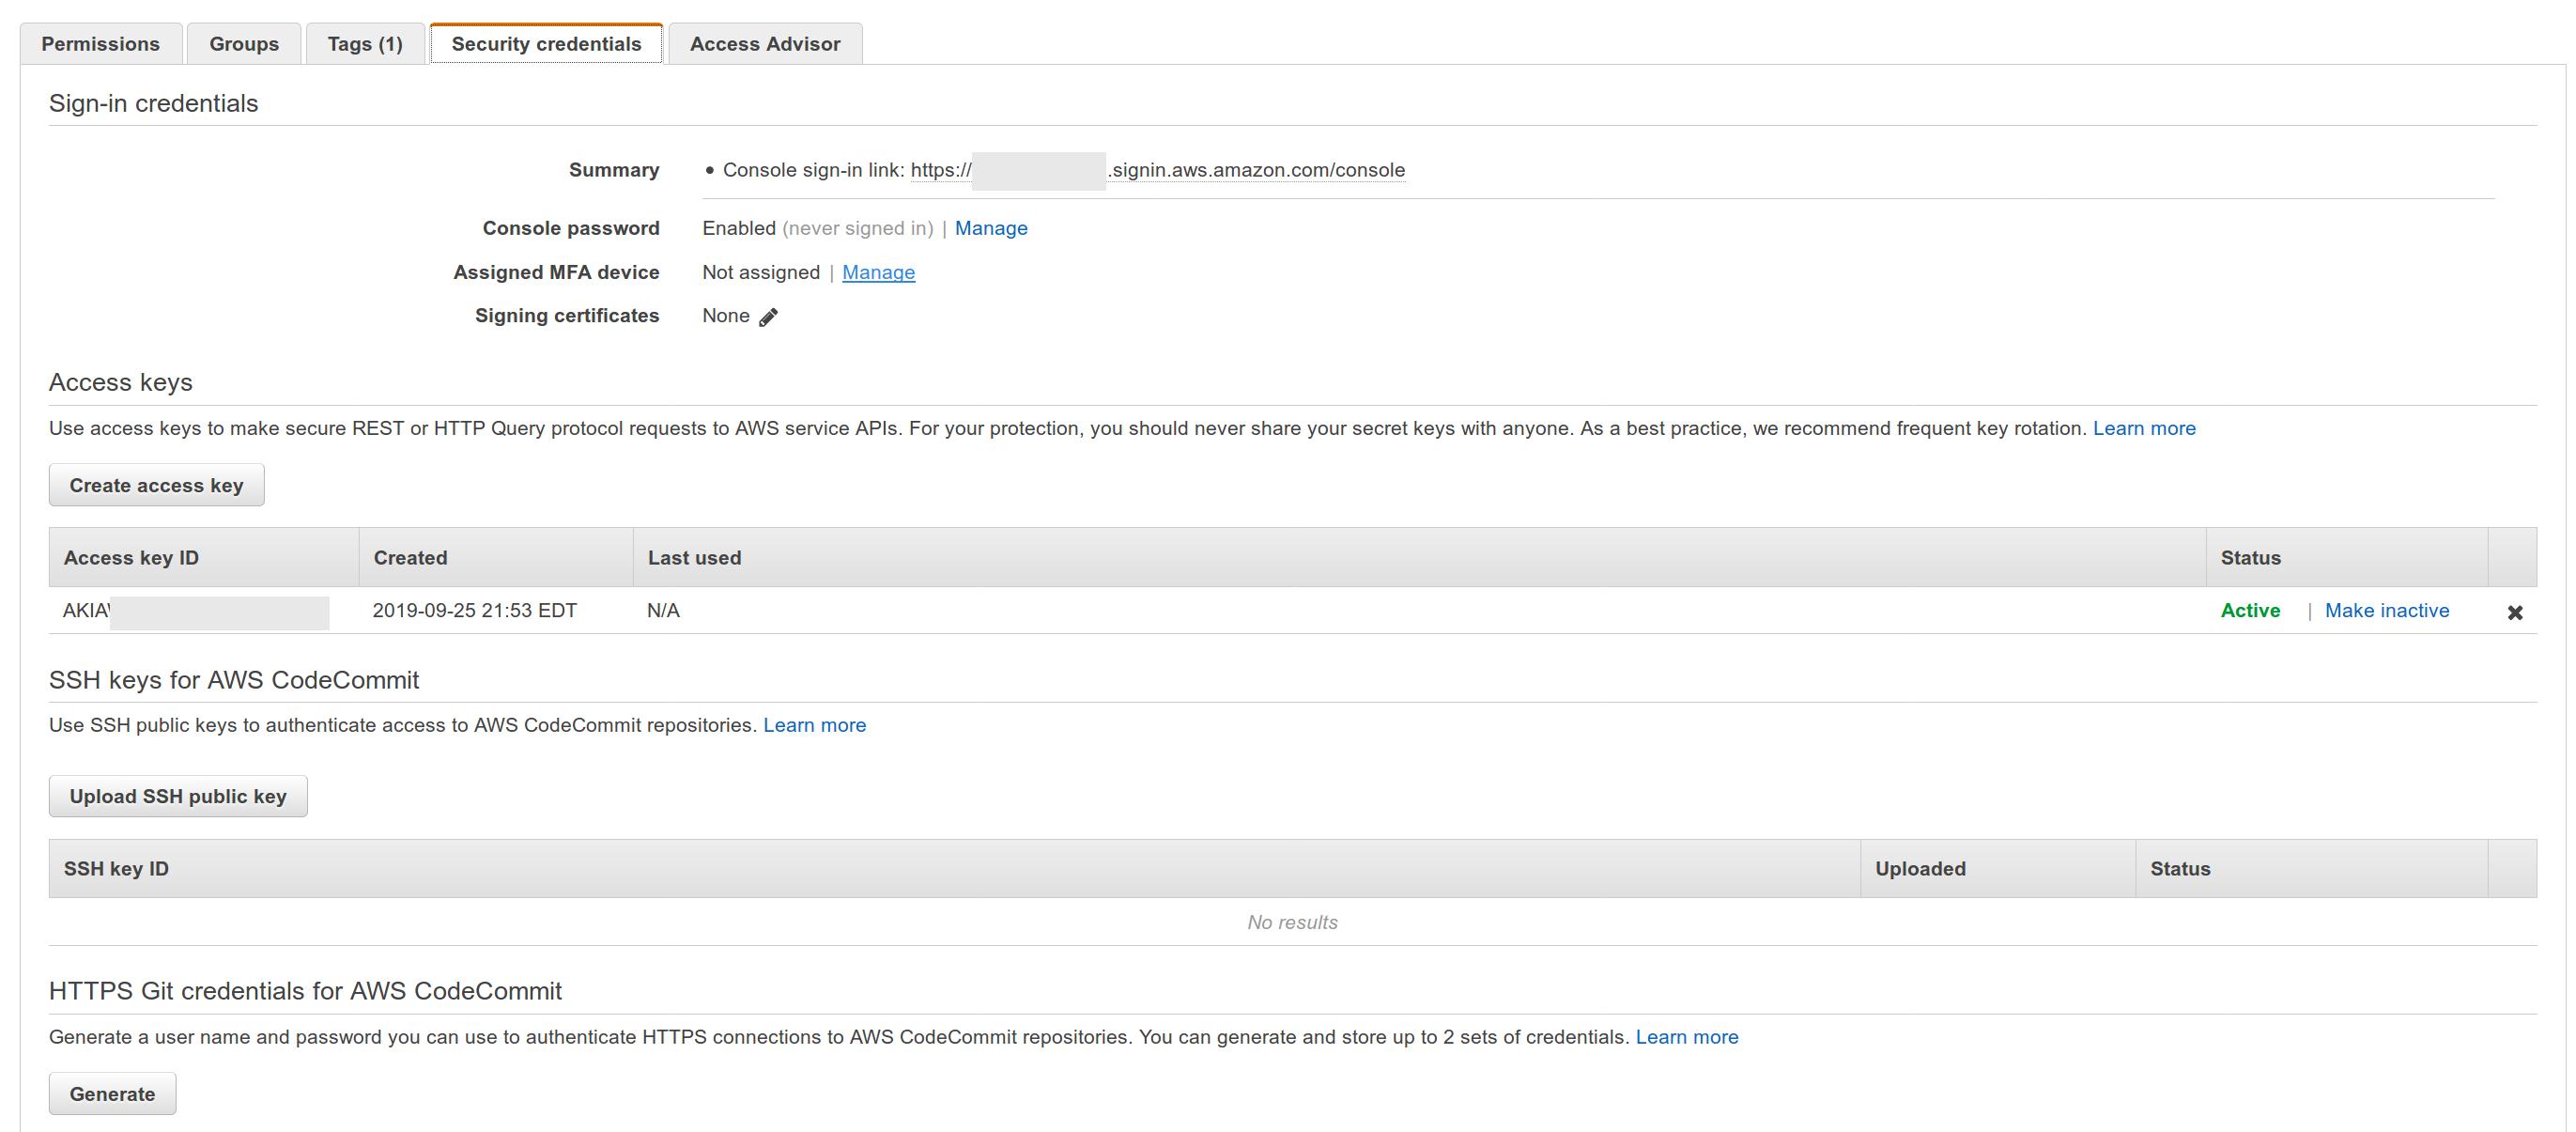 AWS Web console IAM User Security Credentials